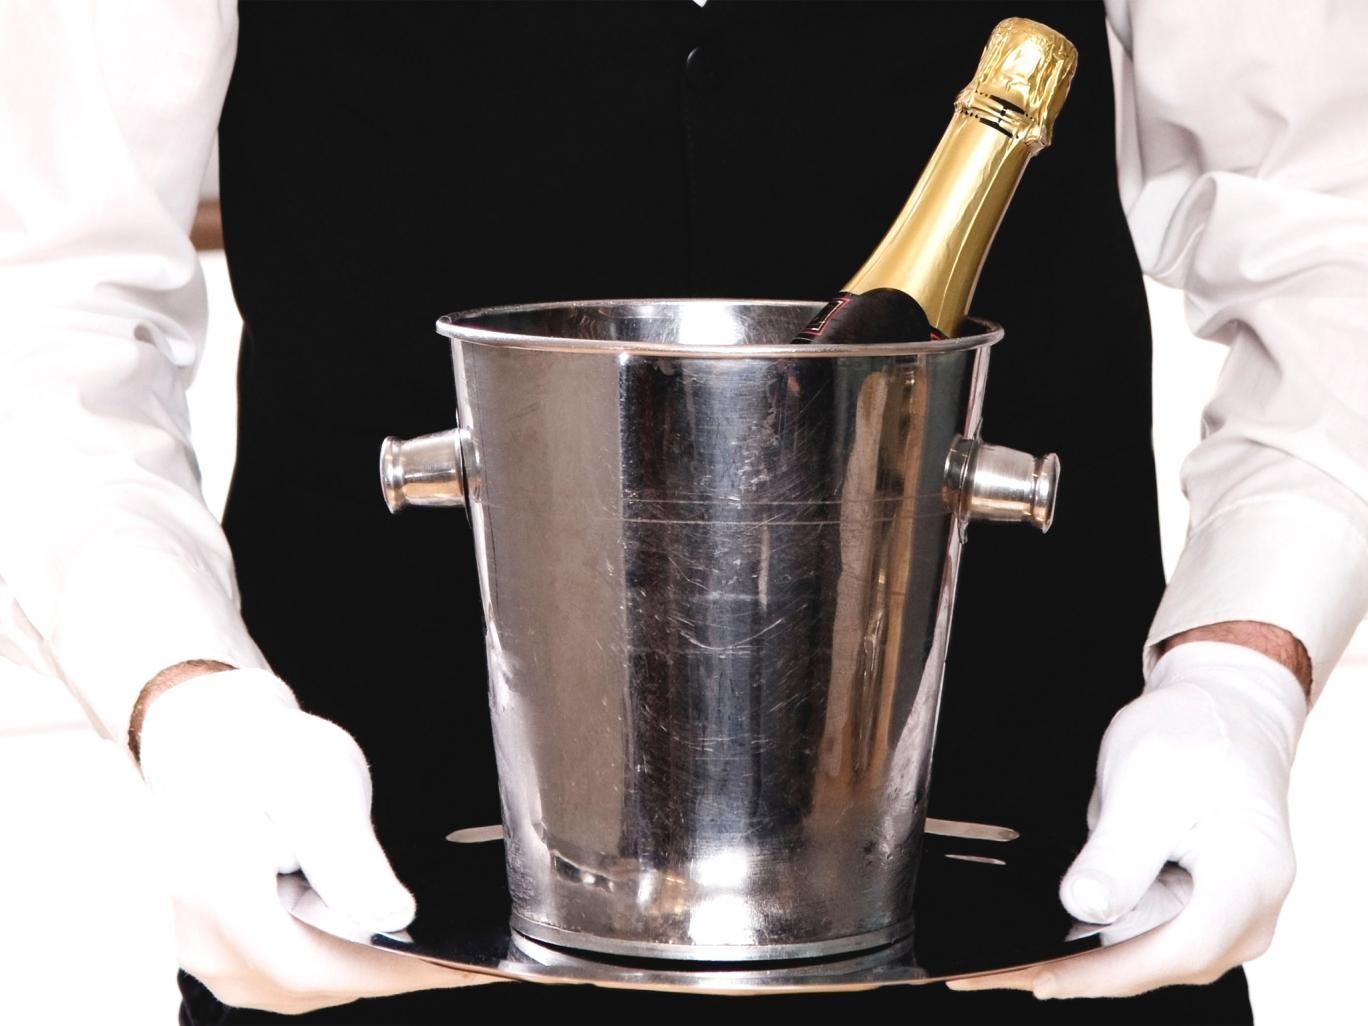 Despite the high menu prices, room service isn't very profitable